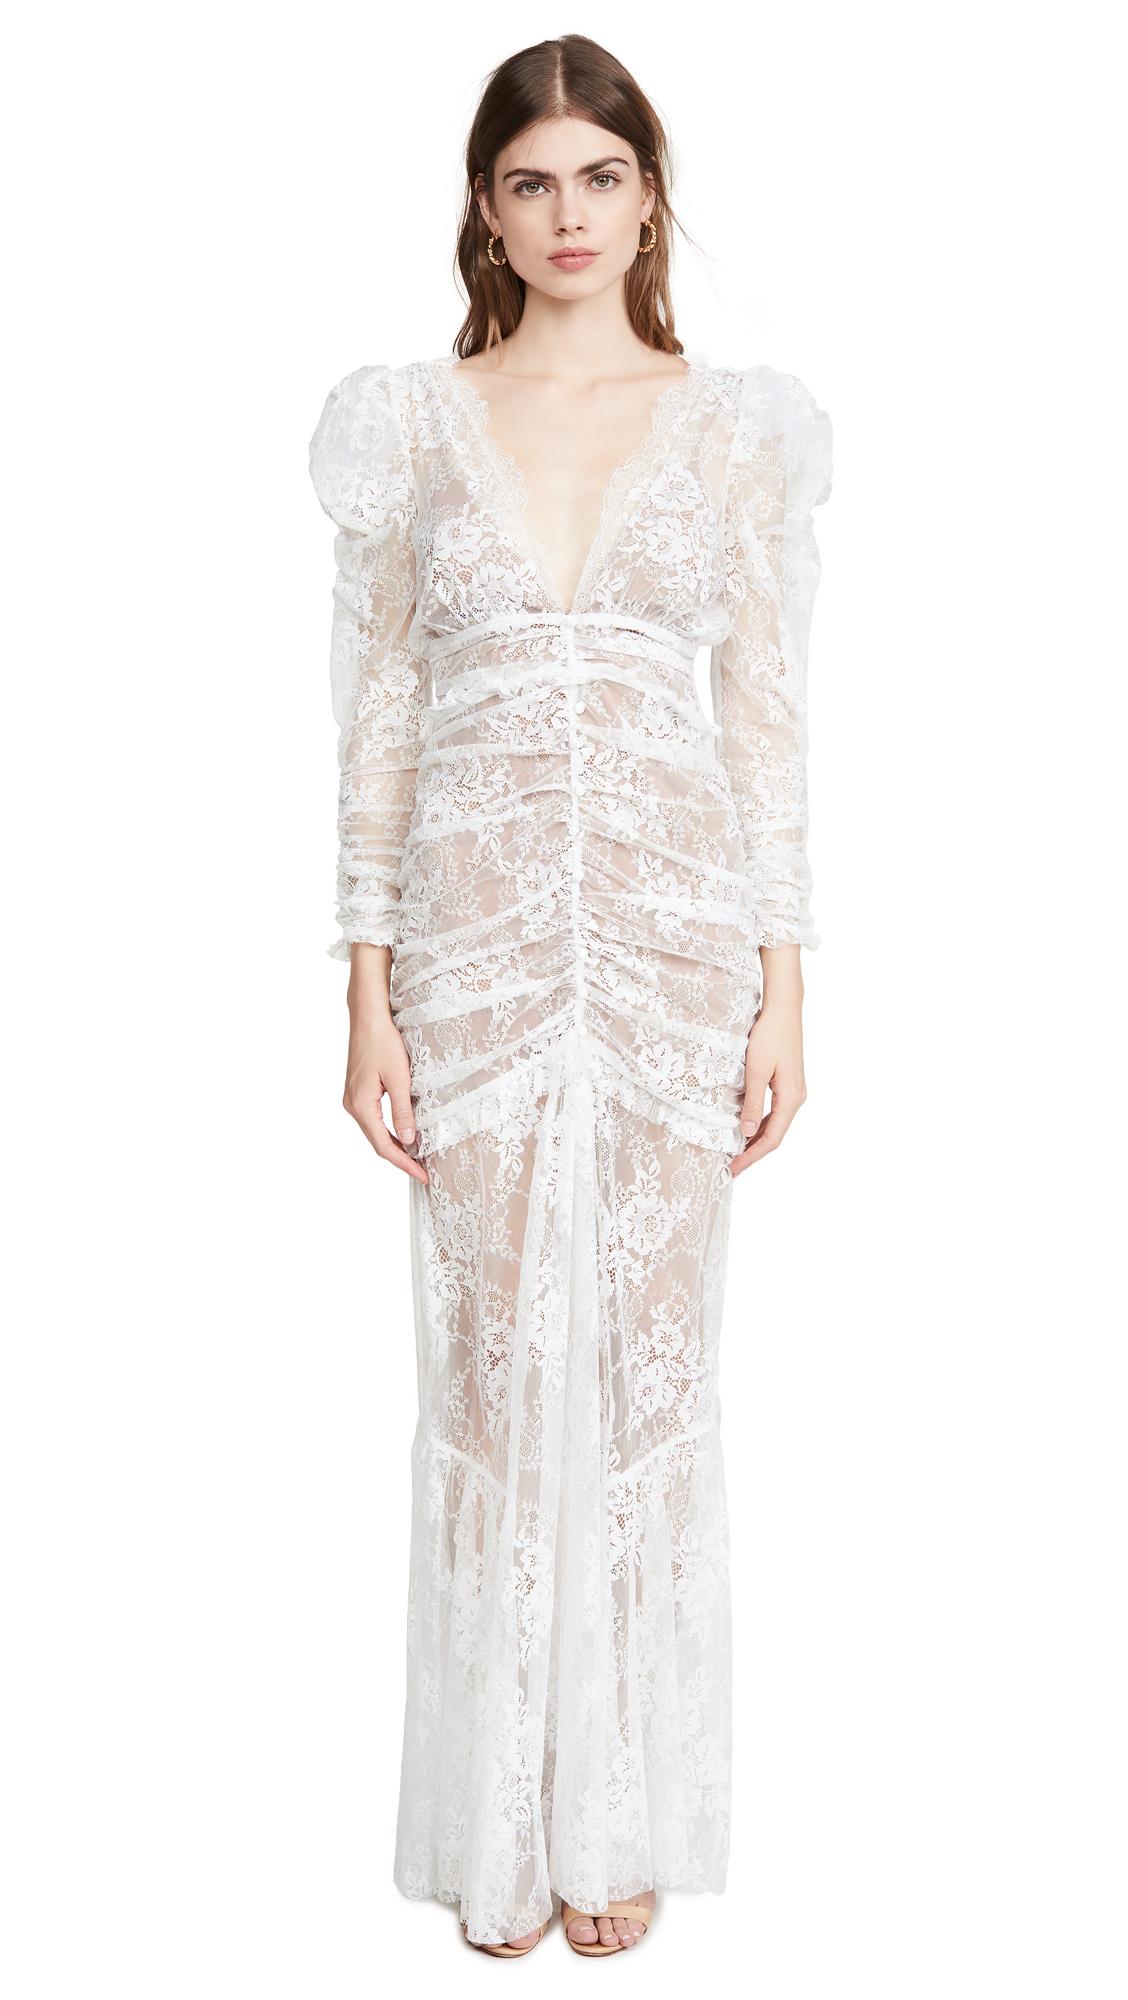 For Love & Lemons Cheyenne Lace Maxi Dress - 30% Off Sale